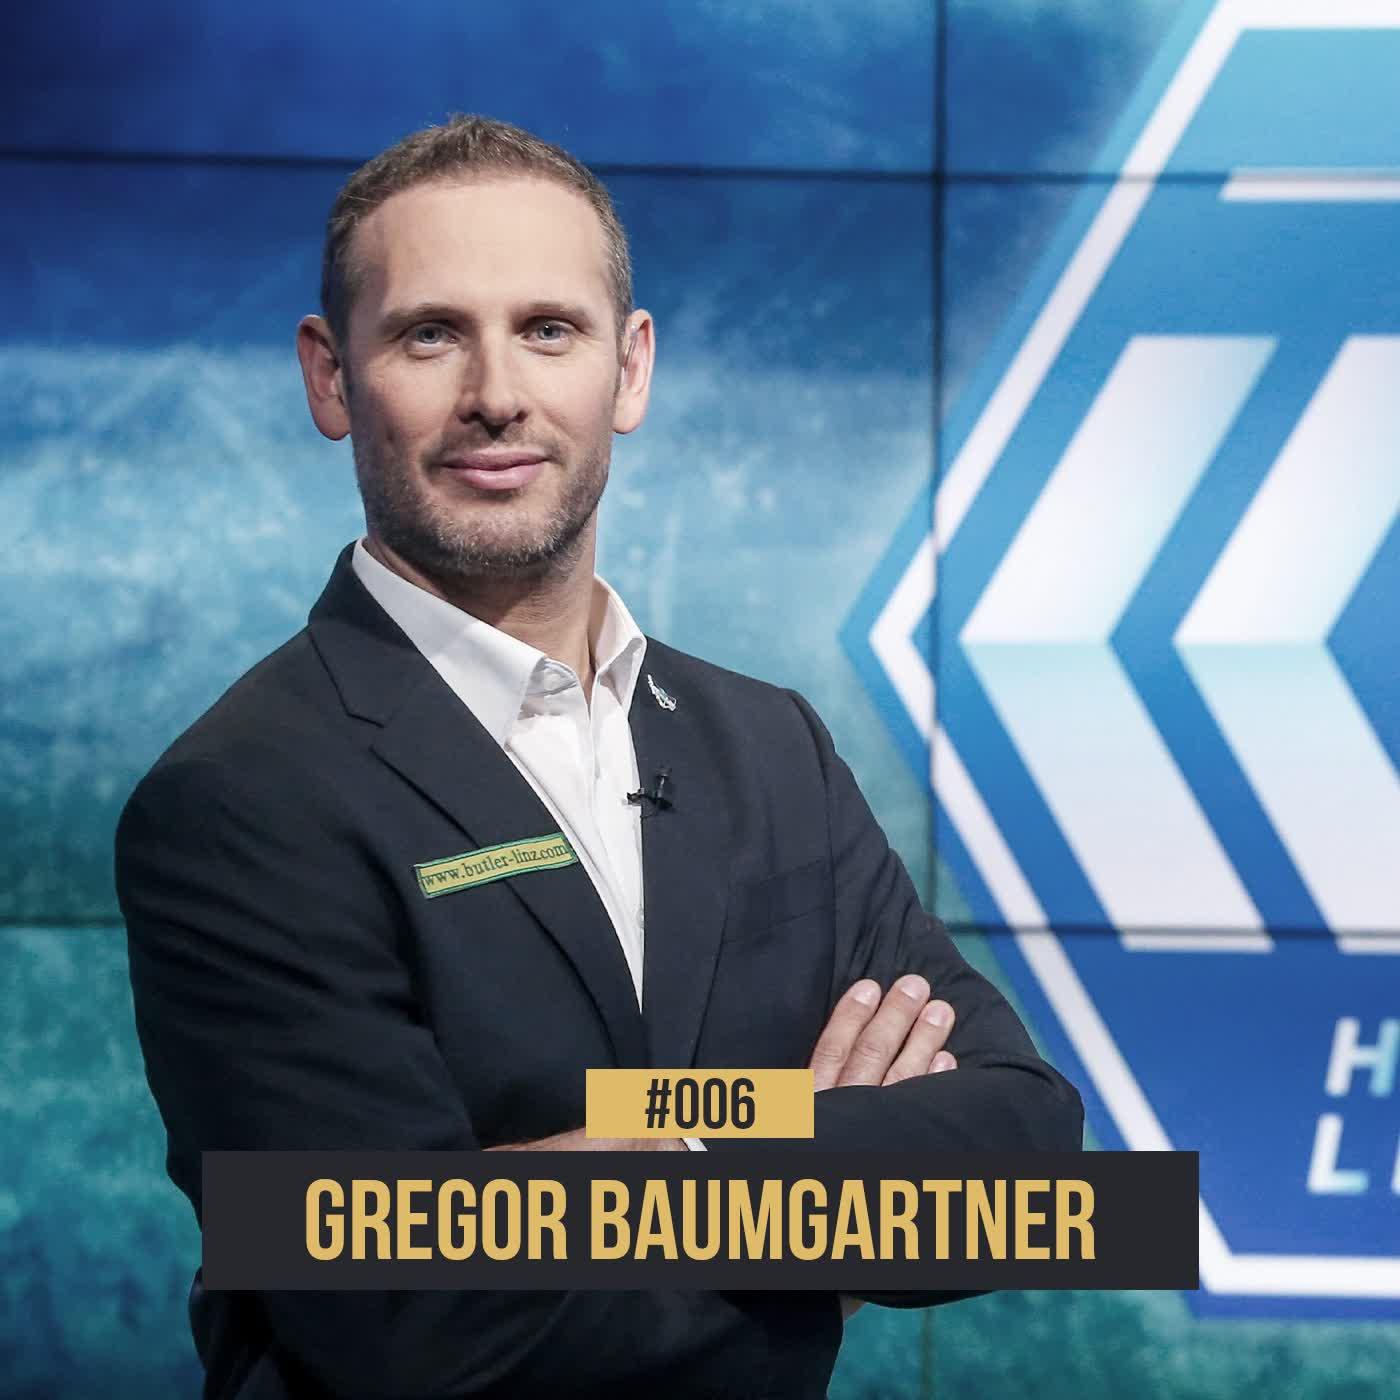 #006 Gregor Baumgartner: Eishockey-Experte auf allen Ebenen